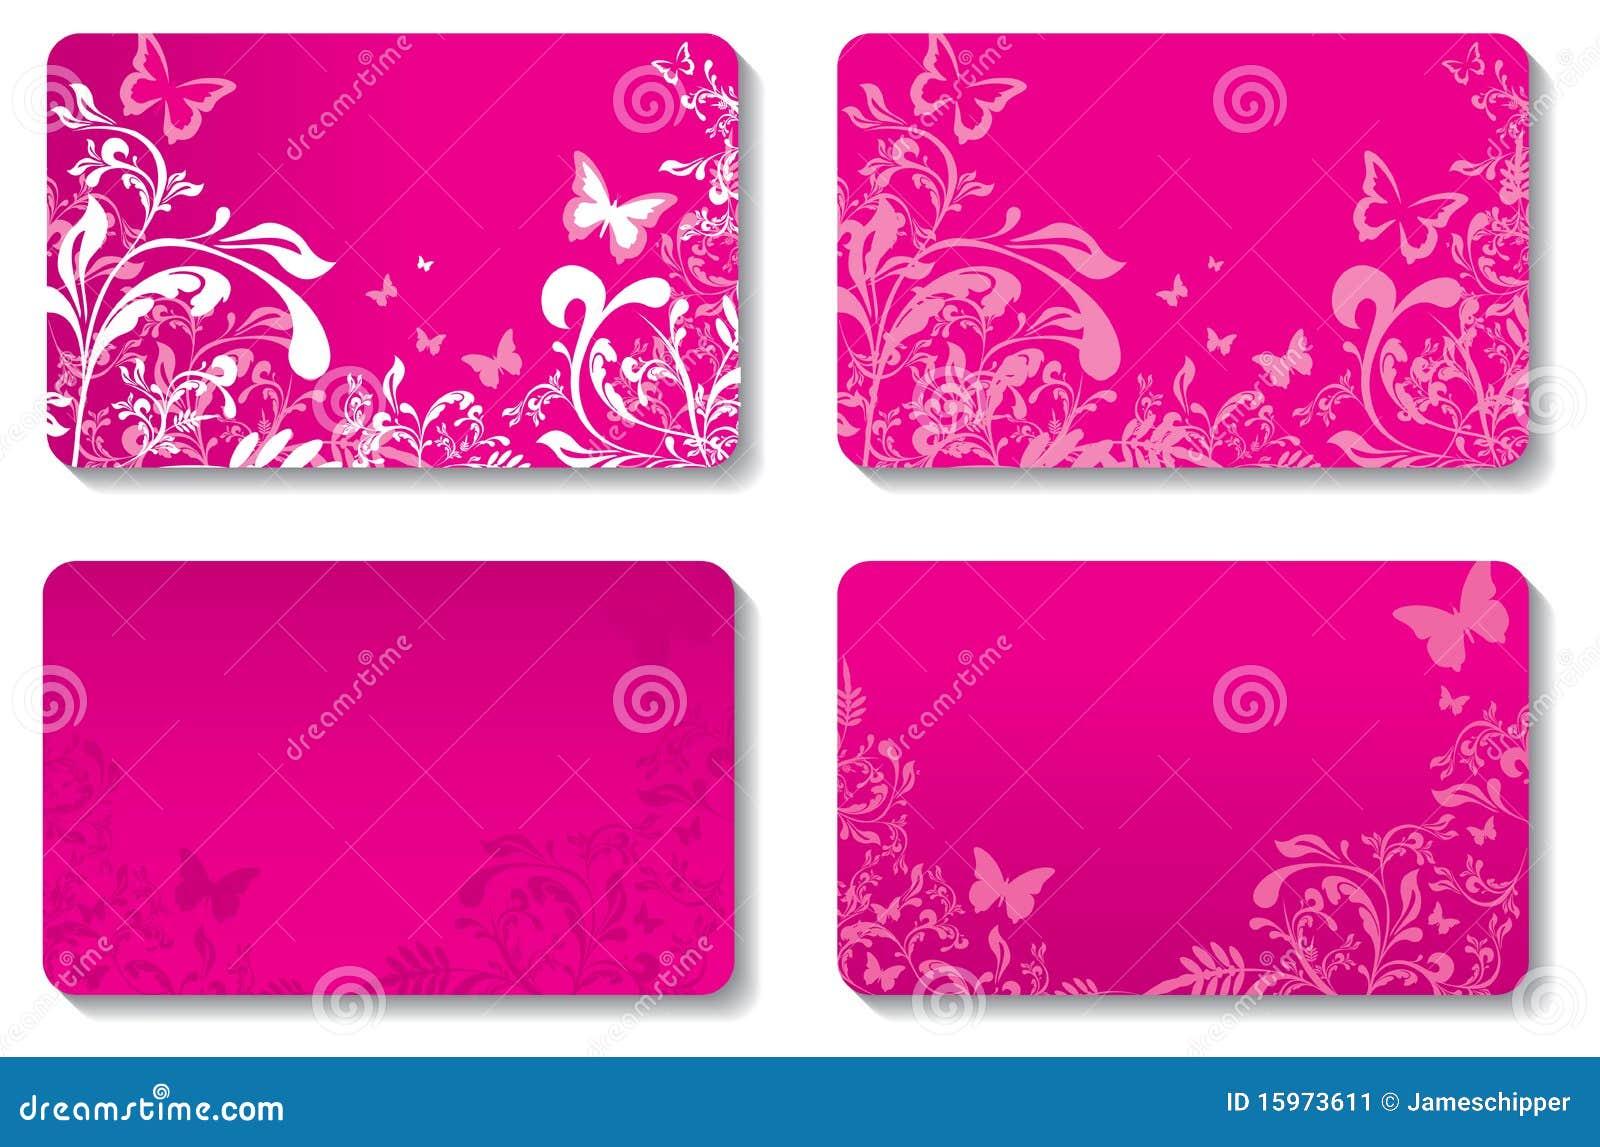 Floral business cards stock vector. Illustration of design - 15973611